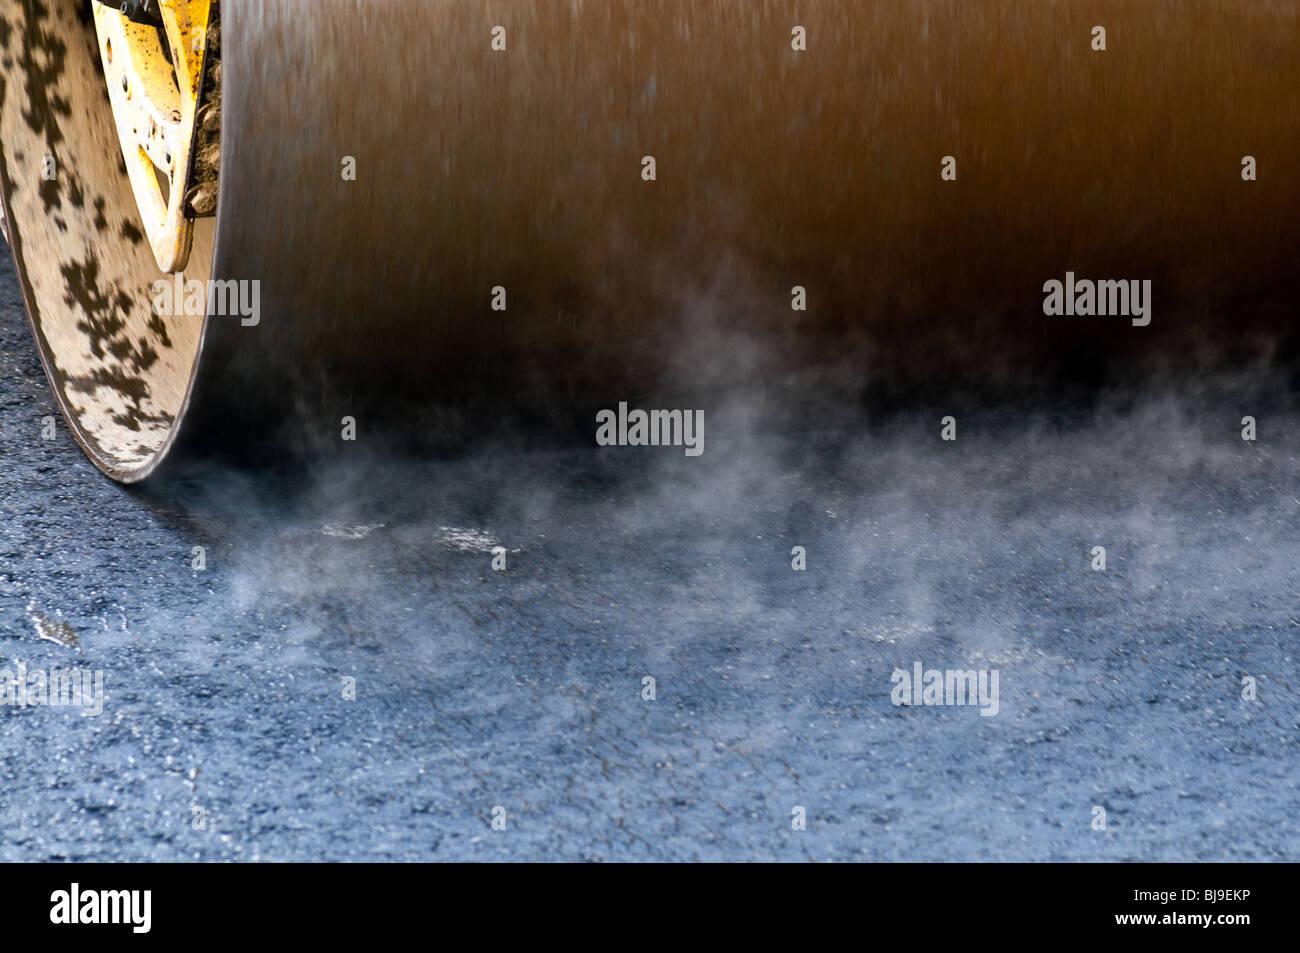 Making new road. Roller press fresh tar. Motion blur. - Stock Image